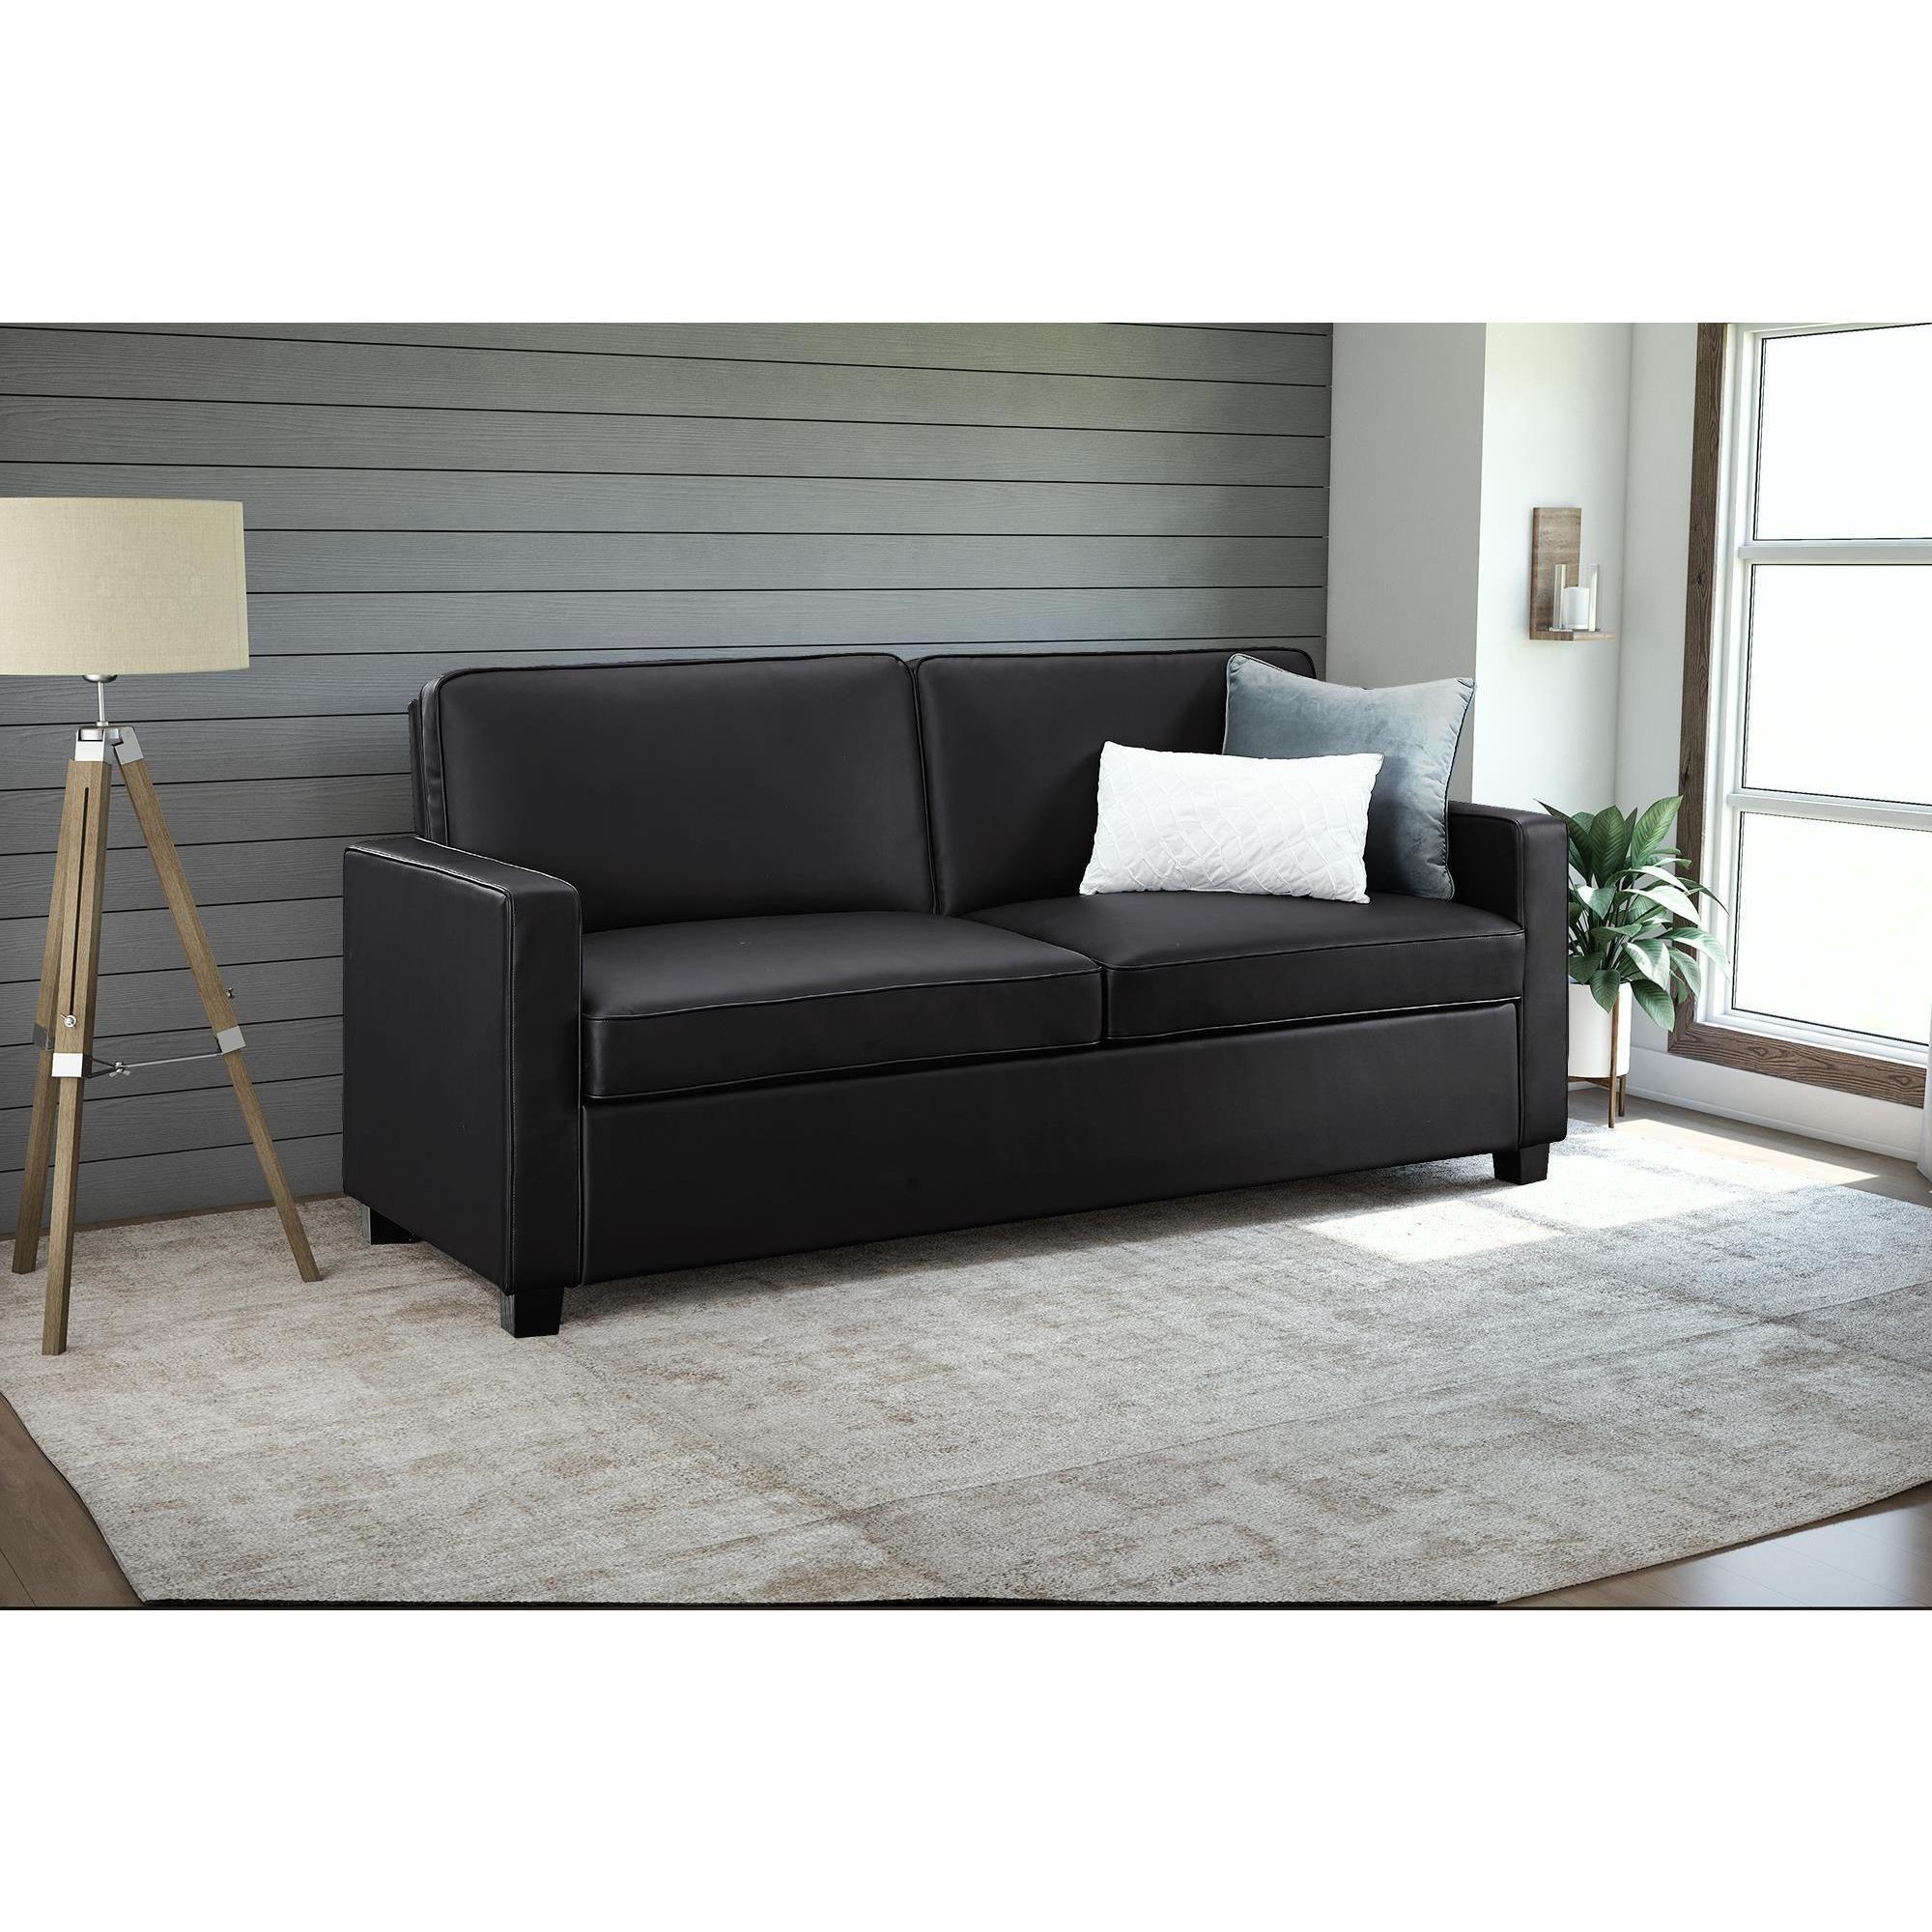 dhp signature sleep casey black faux leather queen sleeper sofa